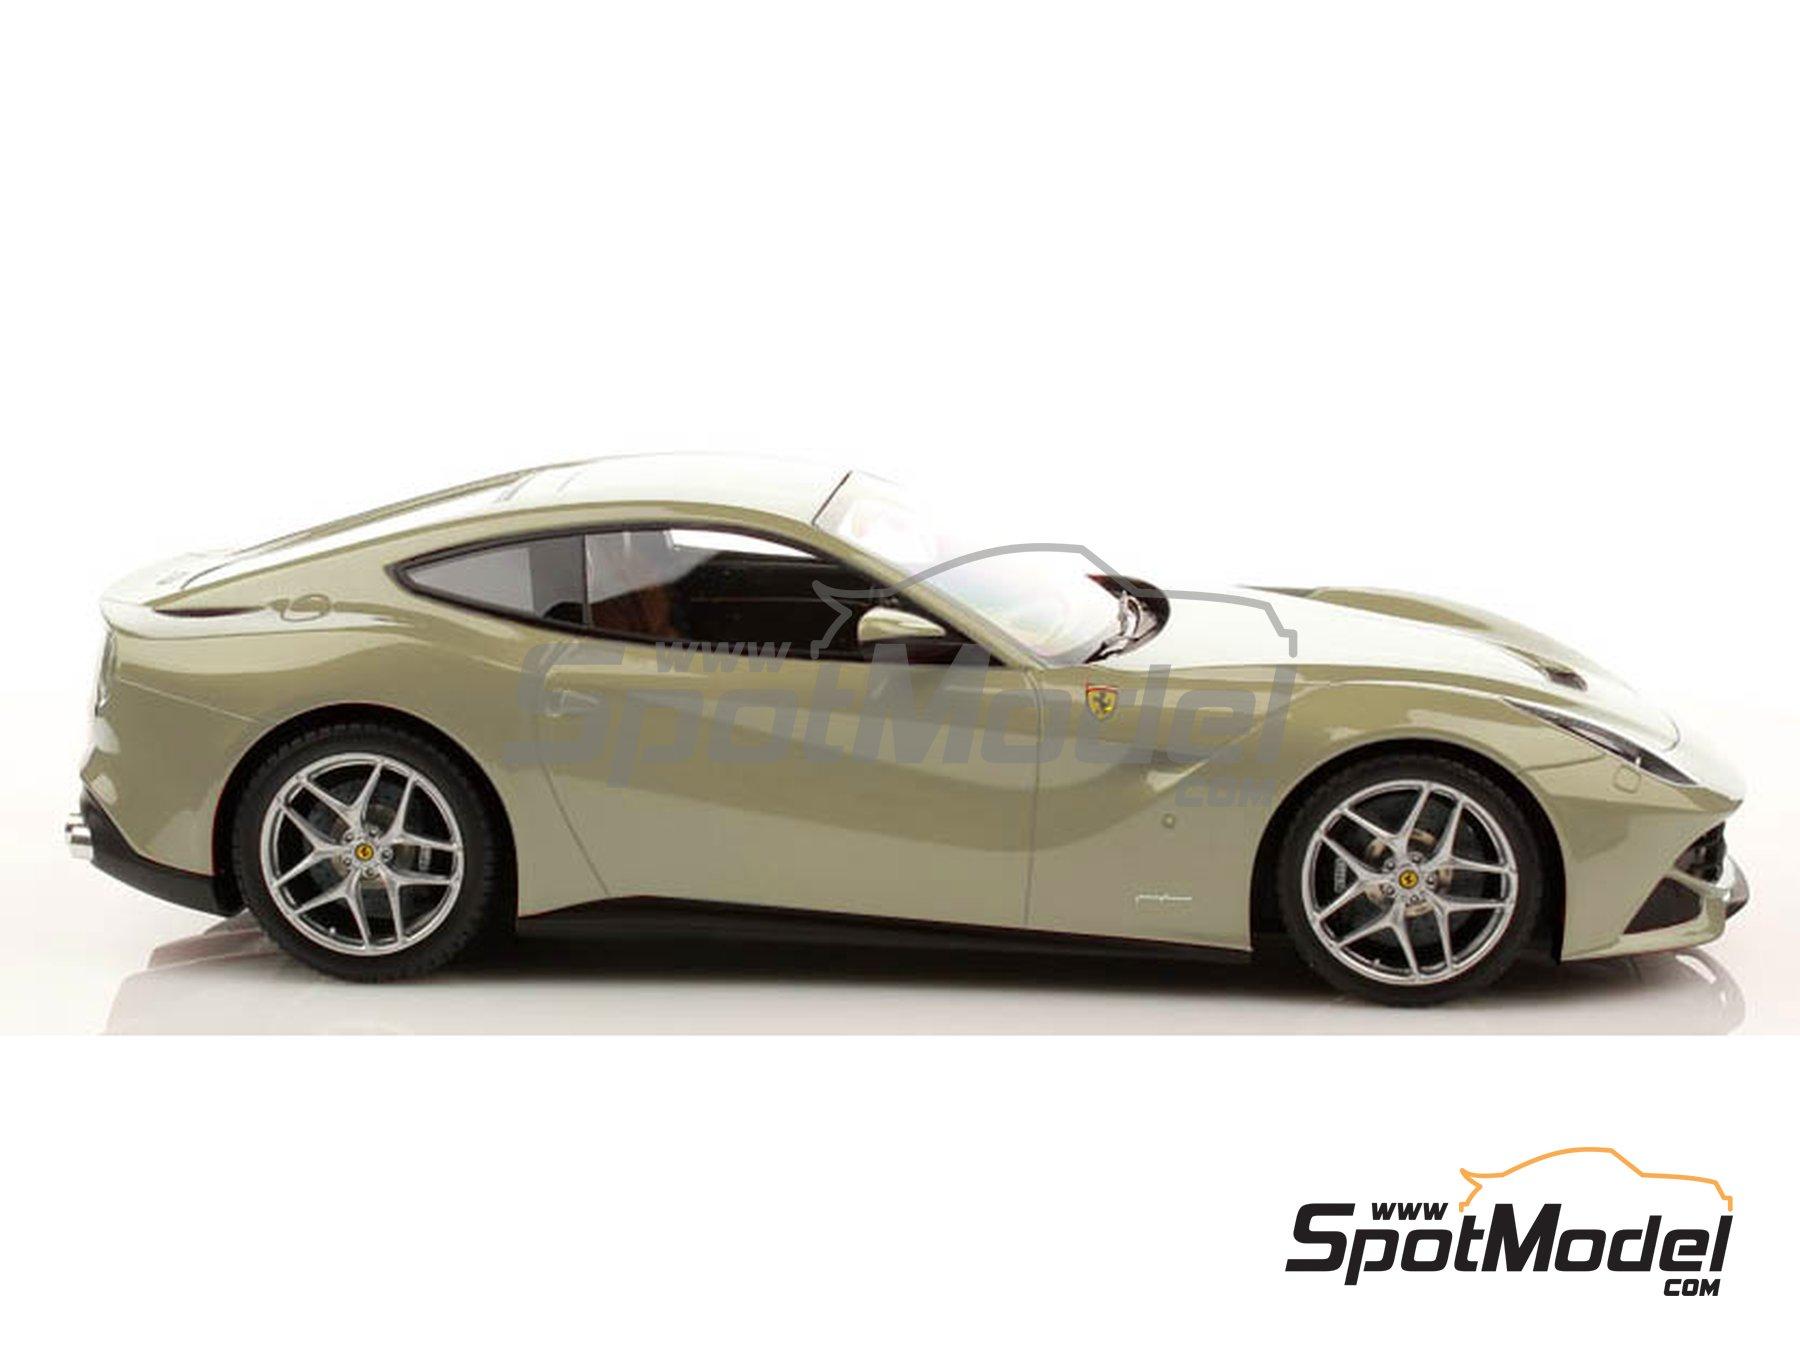 Image 2: Ferrari Grigio Ingrid Metallic Silver - Code: 720 - 1 x 60ml | Paint manufactured by Zero Paints (ref.ZP-1007-720)